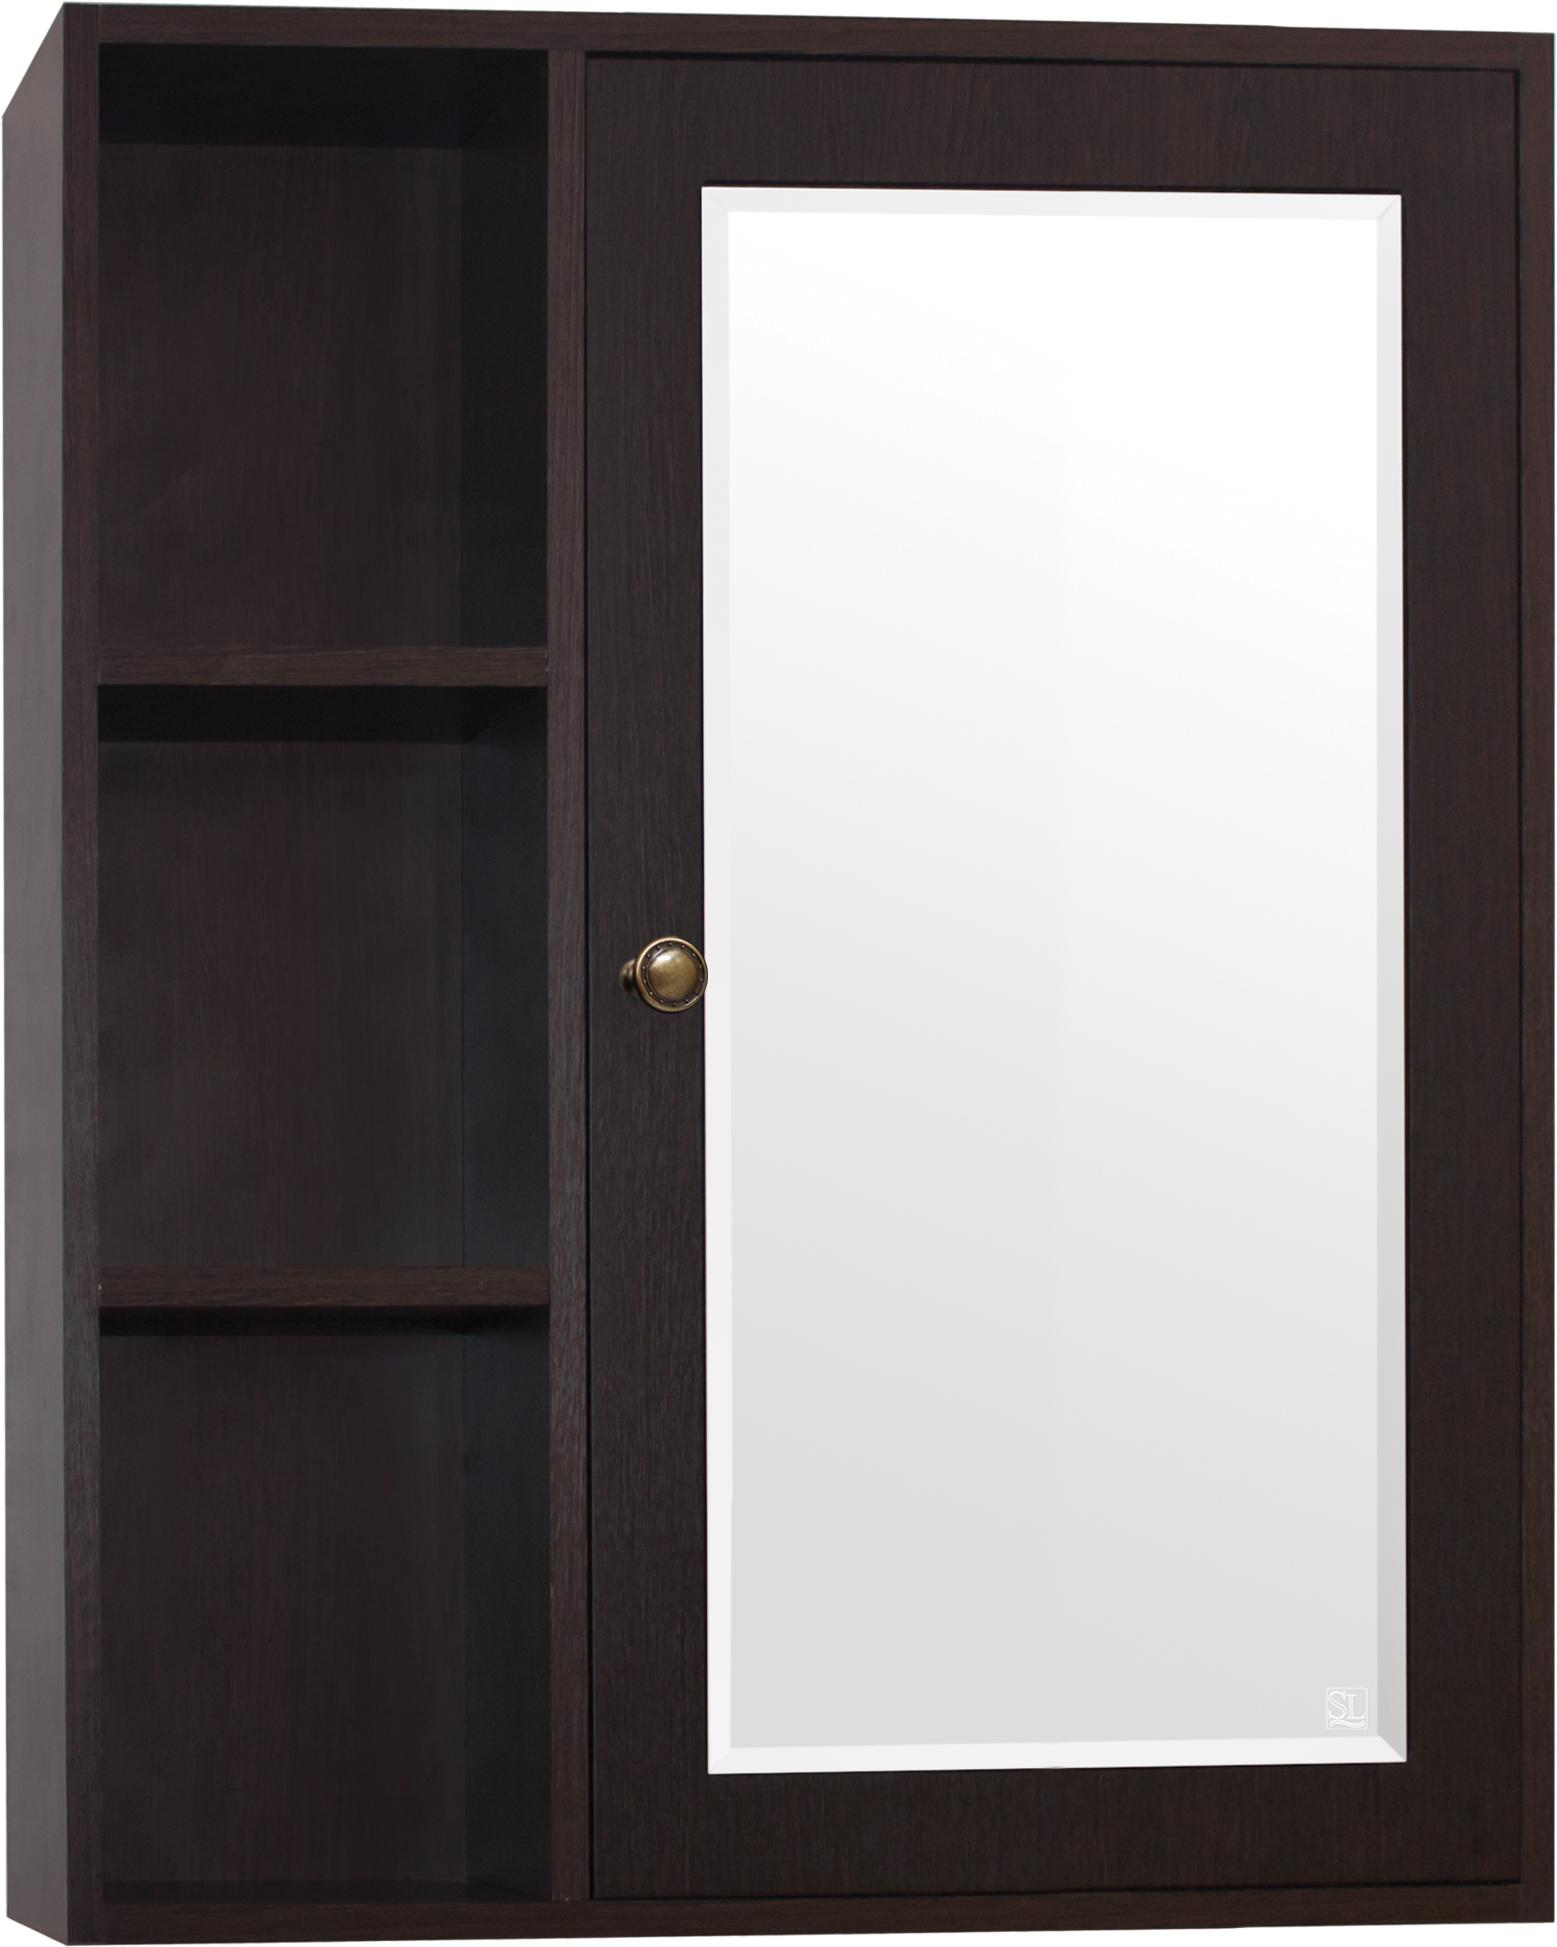 Зеркало-шкаф Style Line Кантри 65 венге